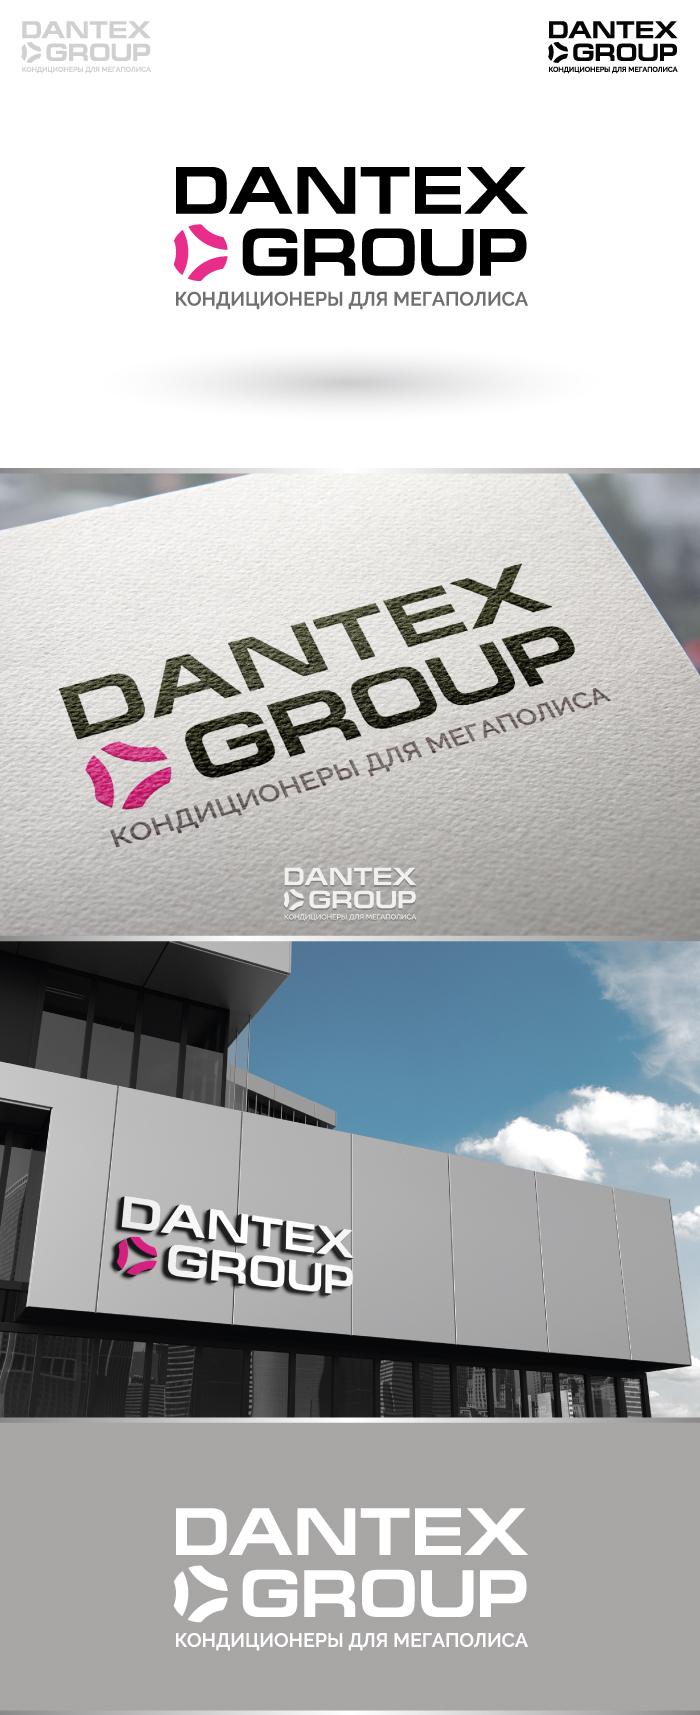 Конкурс на разработку логотипа для компании Dantex Group  фото f_1705c0e59aeb6724.jpg